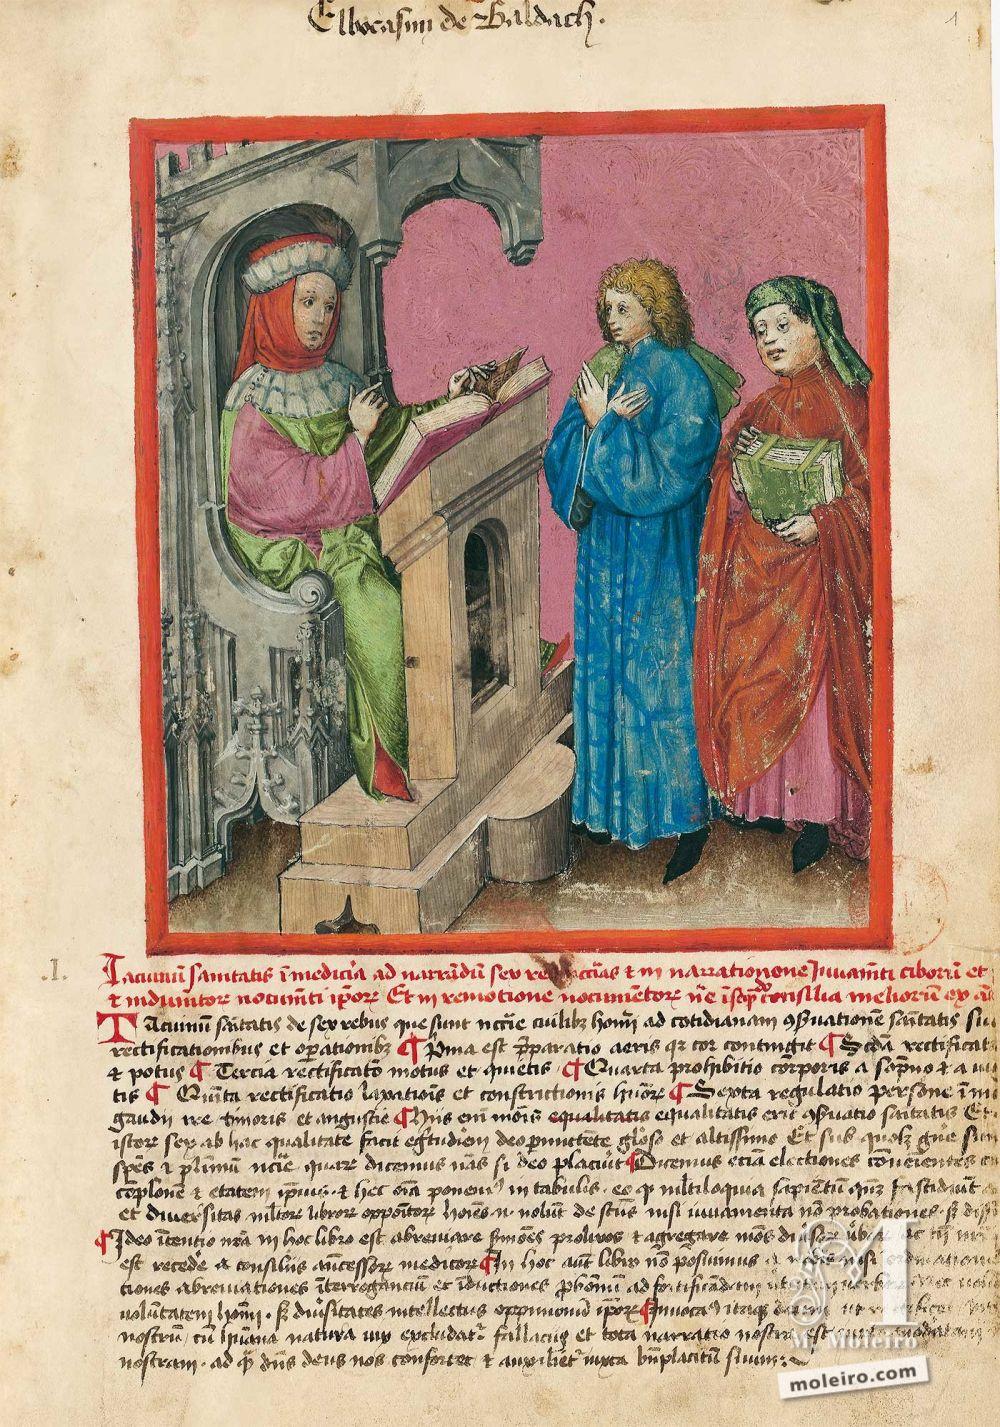 Tacuinum Sanitatis f. 1r, Elbocasim de Baldach